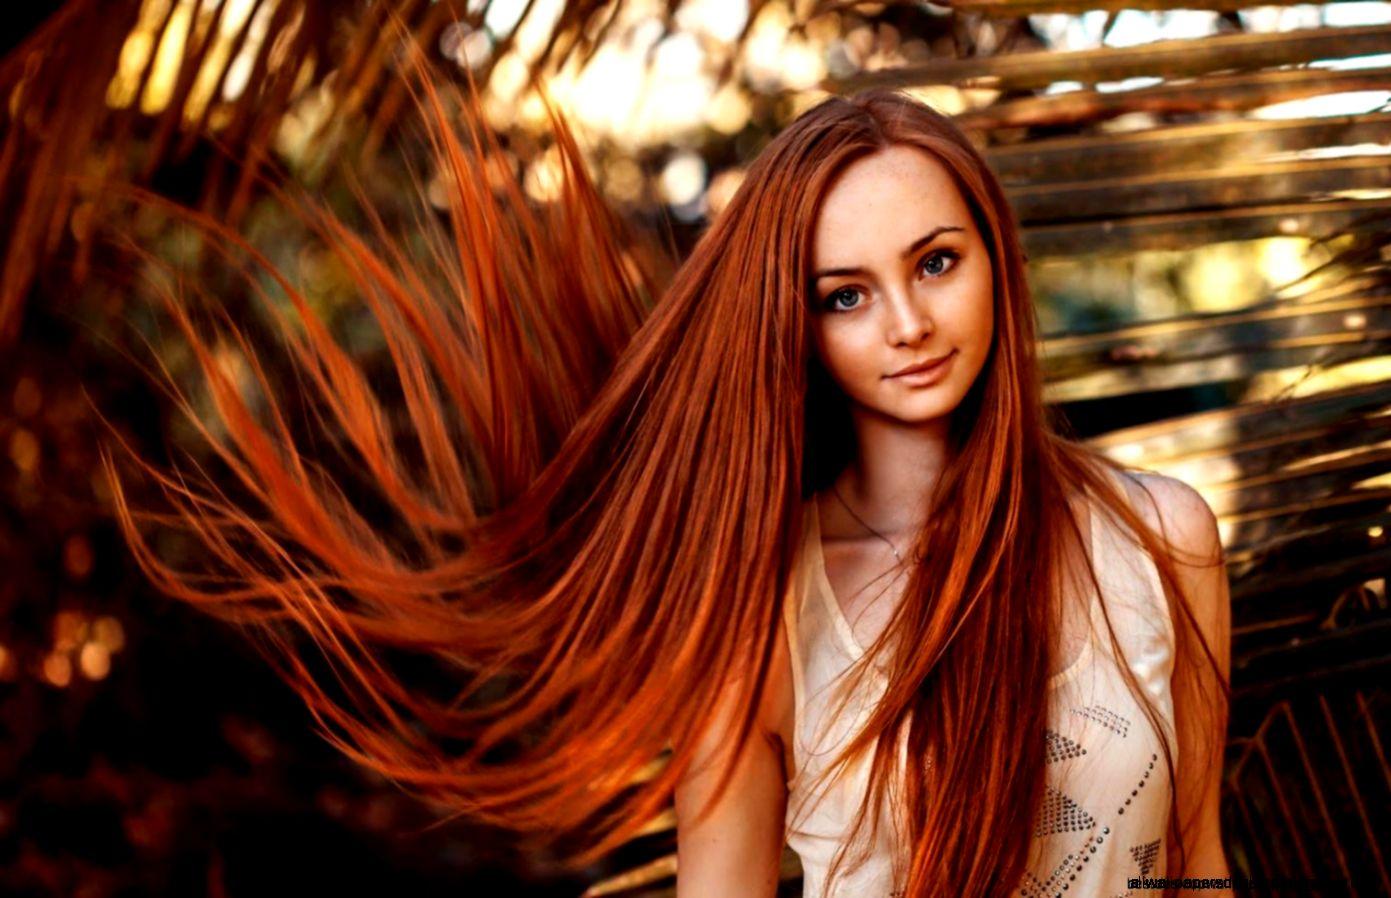 Redhead Girl Hd Wallpaper  Best Desktop Wallpapers